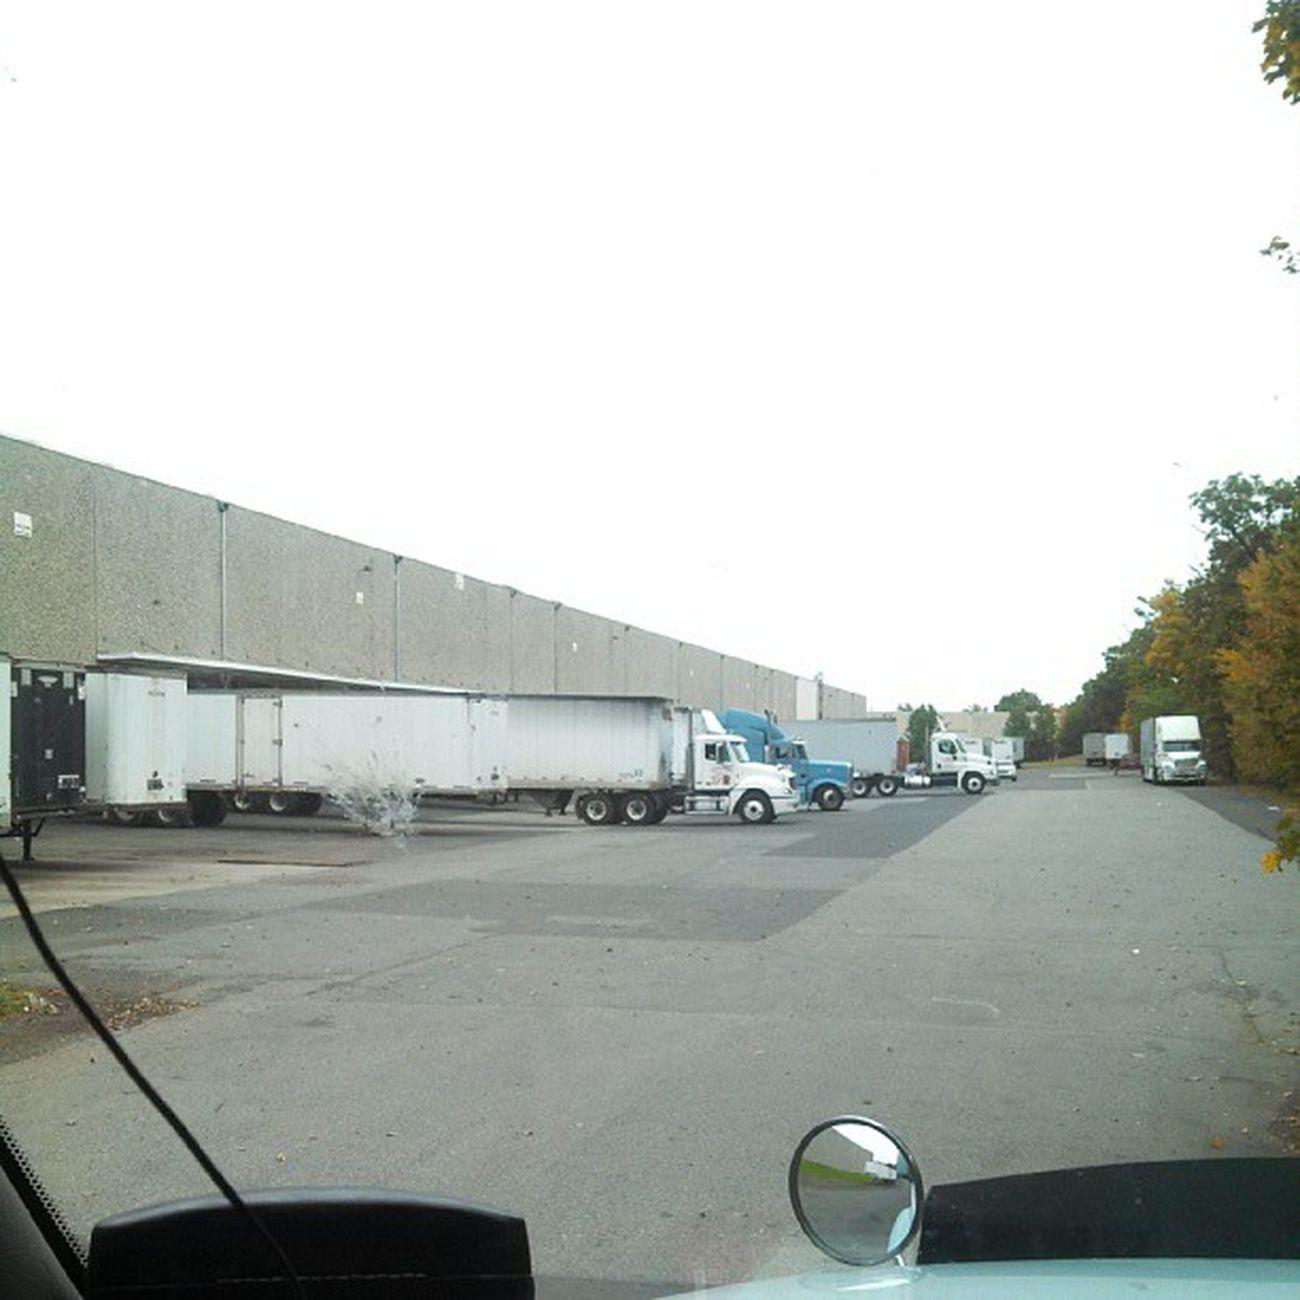 Truckinglife Truckerslife Lifeontheroad